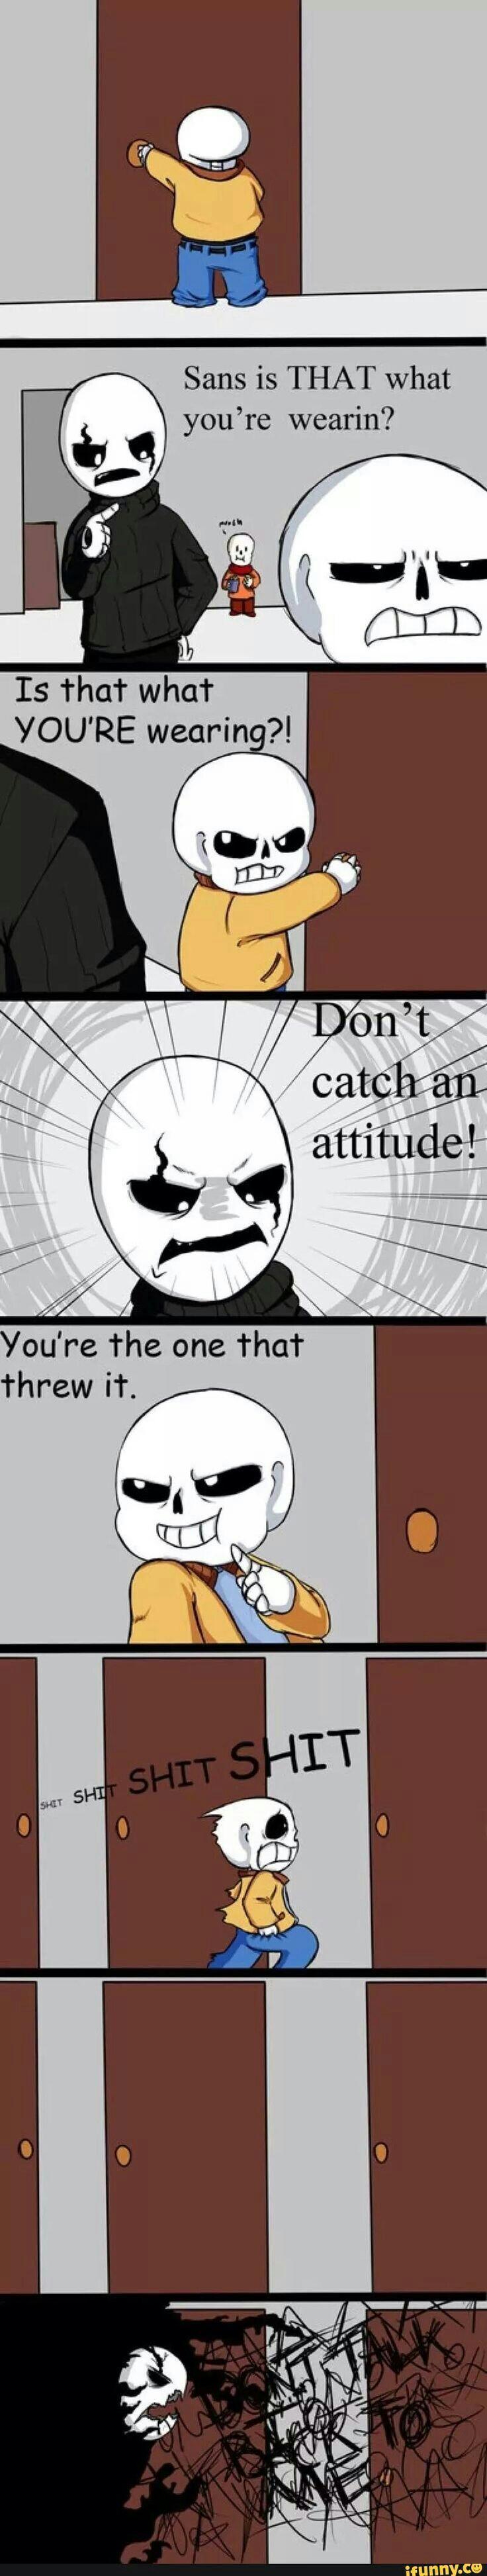 OH DANG DON'T ANGER GASTER